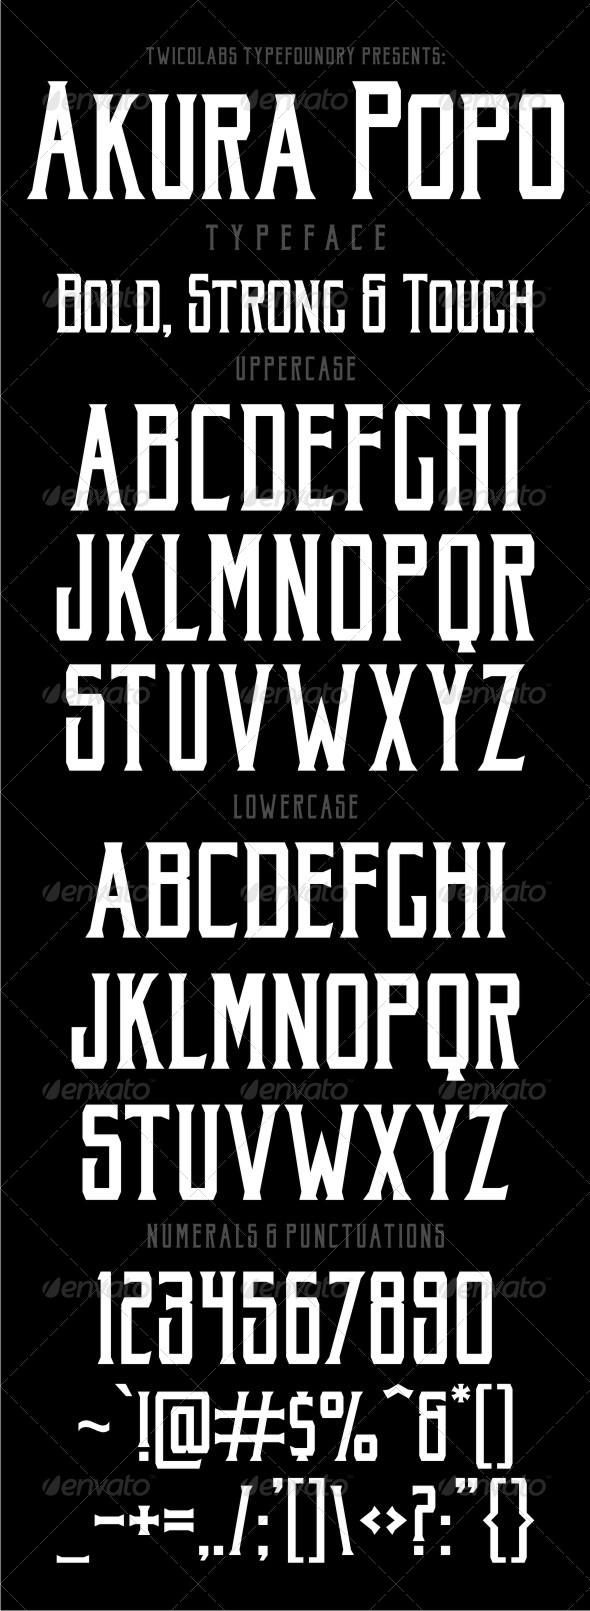 GraphicRiver Akura Popo Typeface 6824189